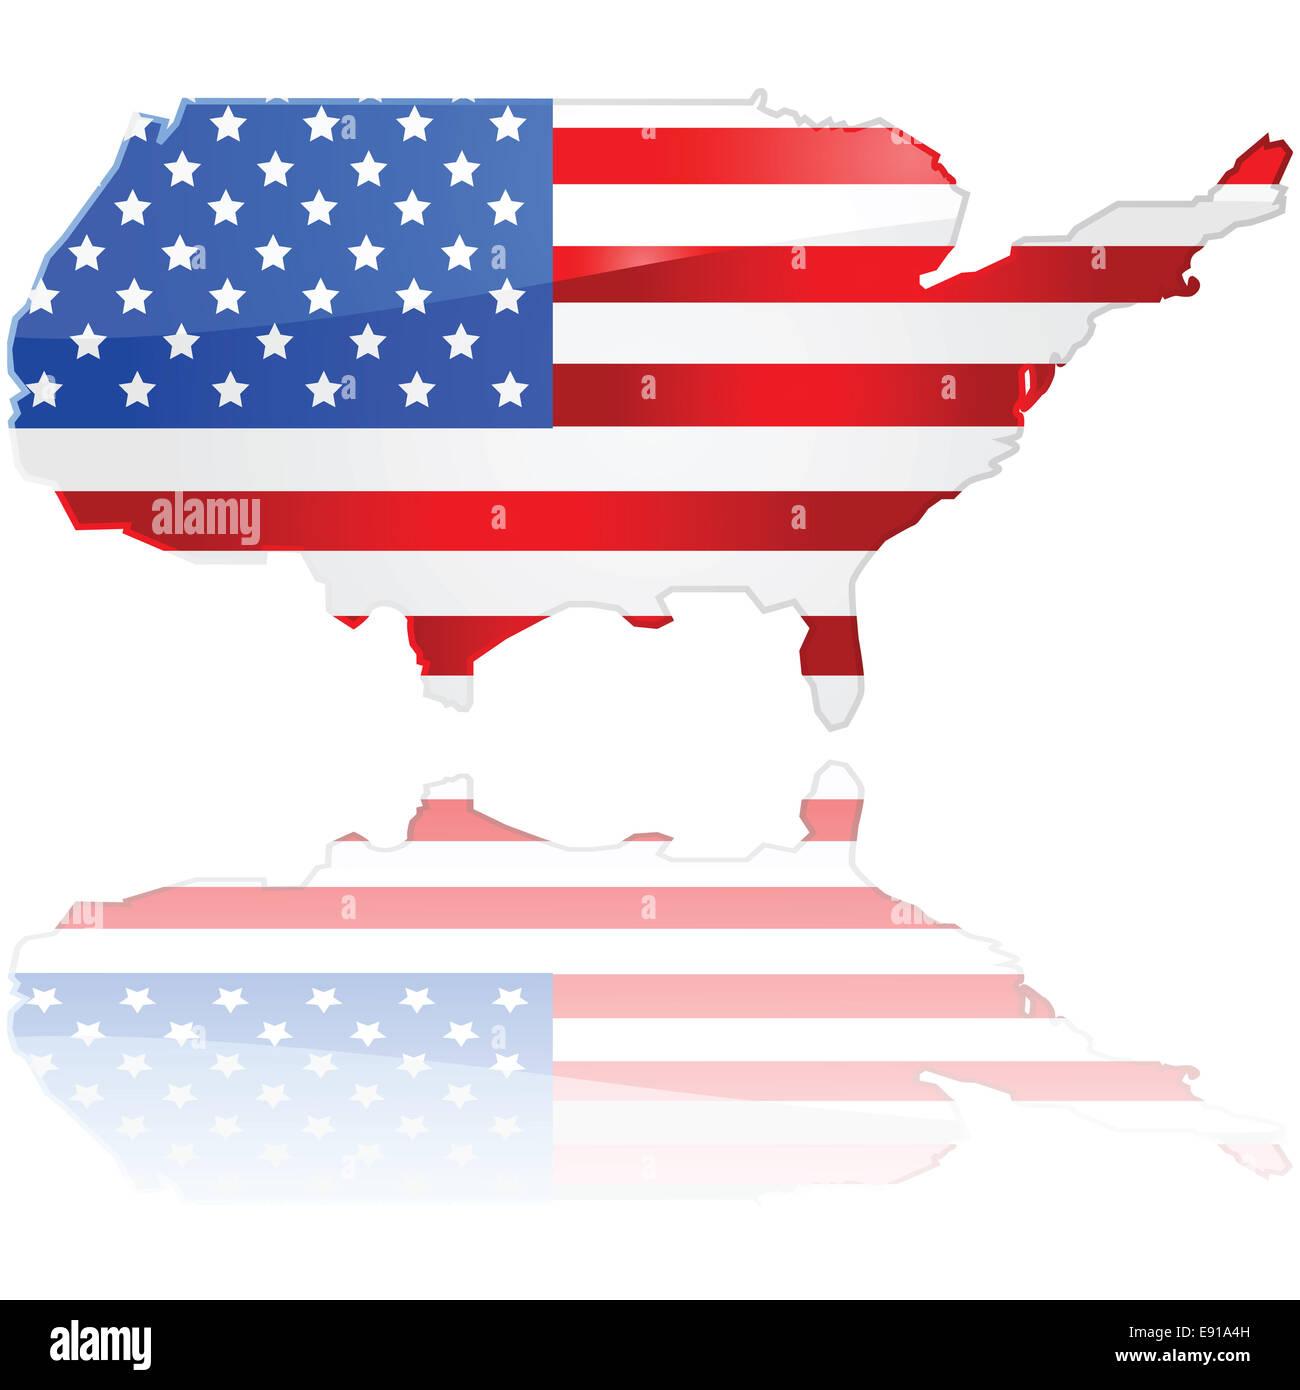 Usa Map Flag Stock Photos & Usa Map Flag Stock Images - Alamy